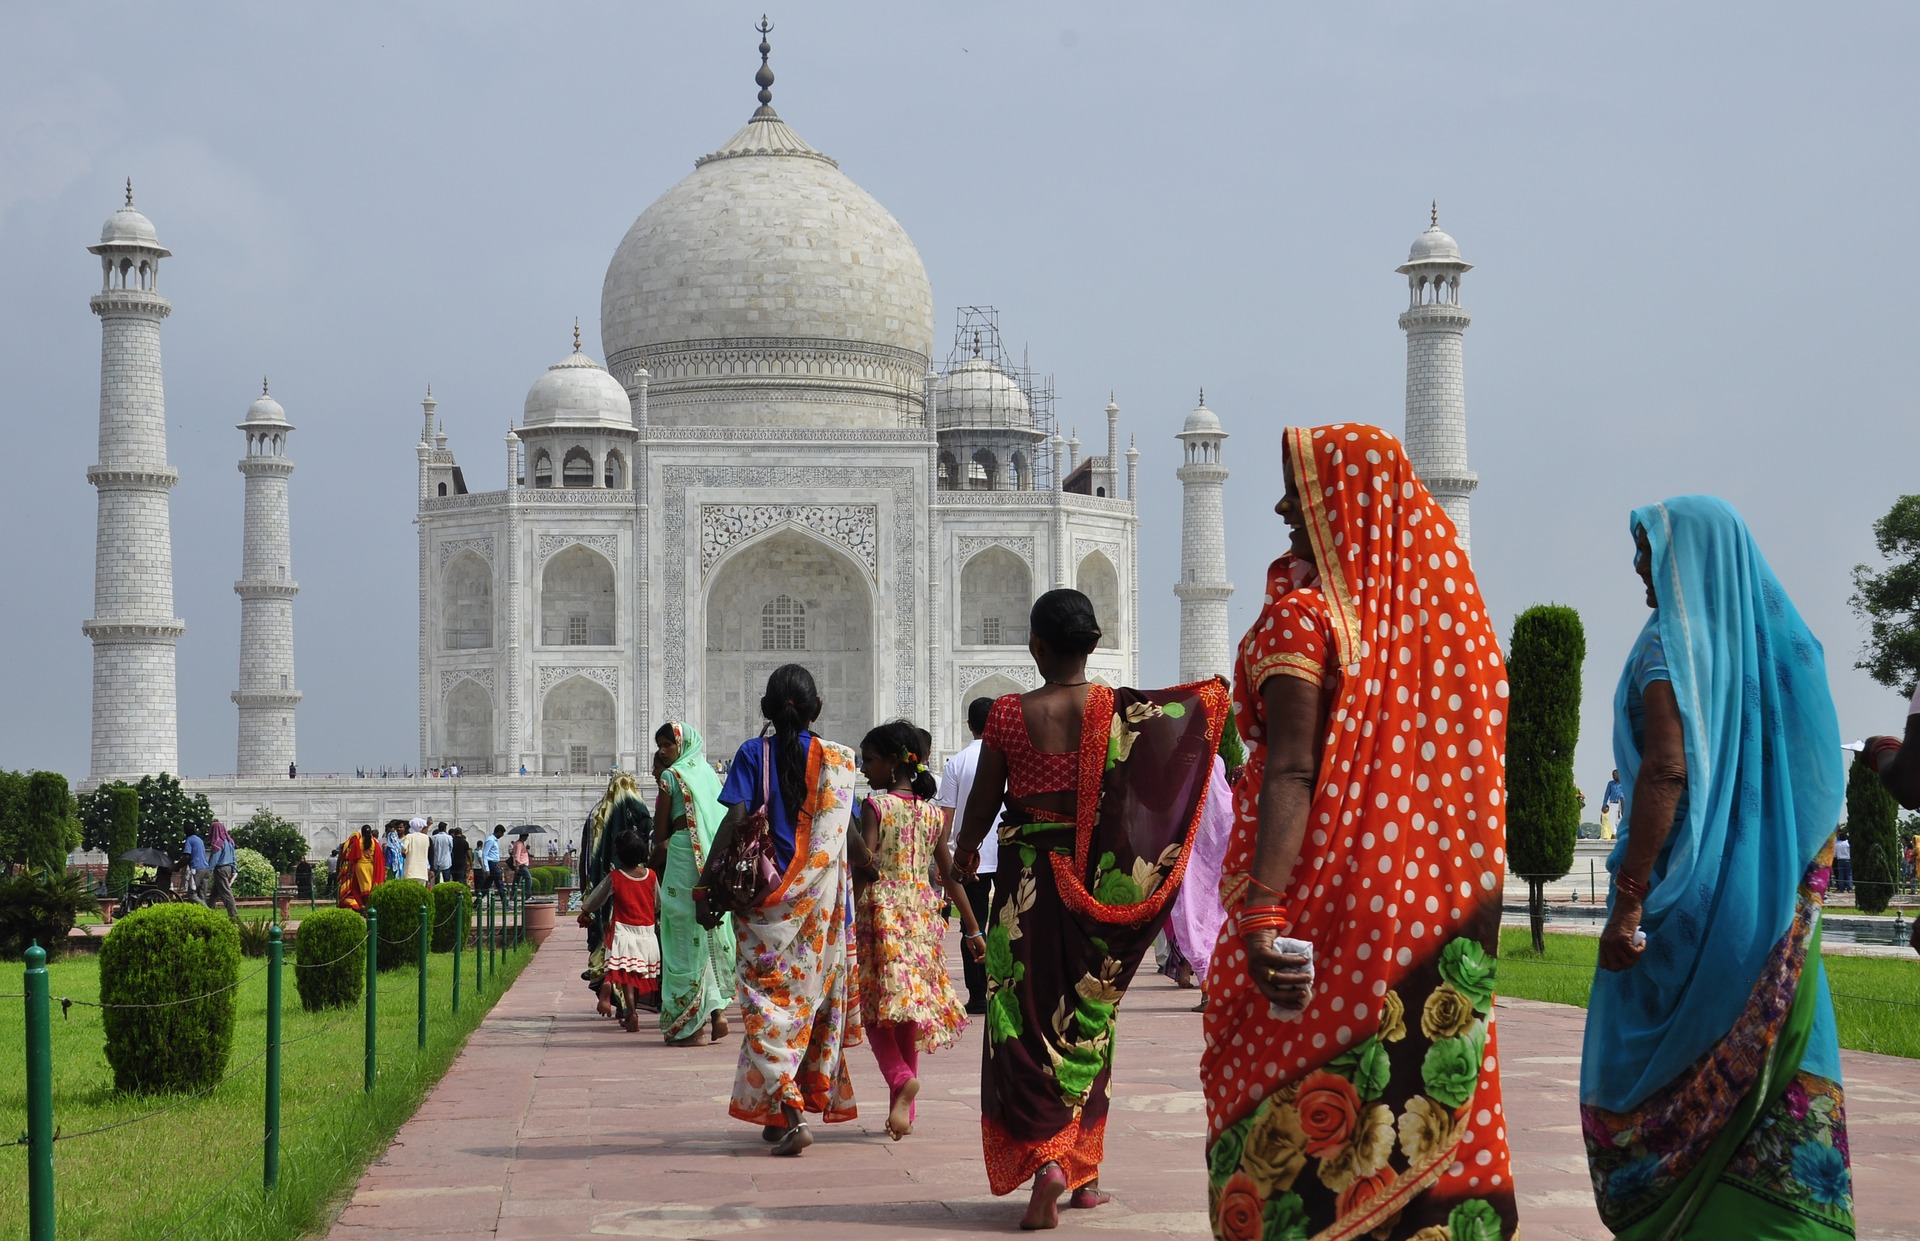 Taj Majal near Agra, India with women in local dress